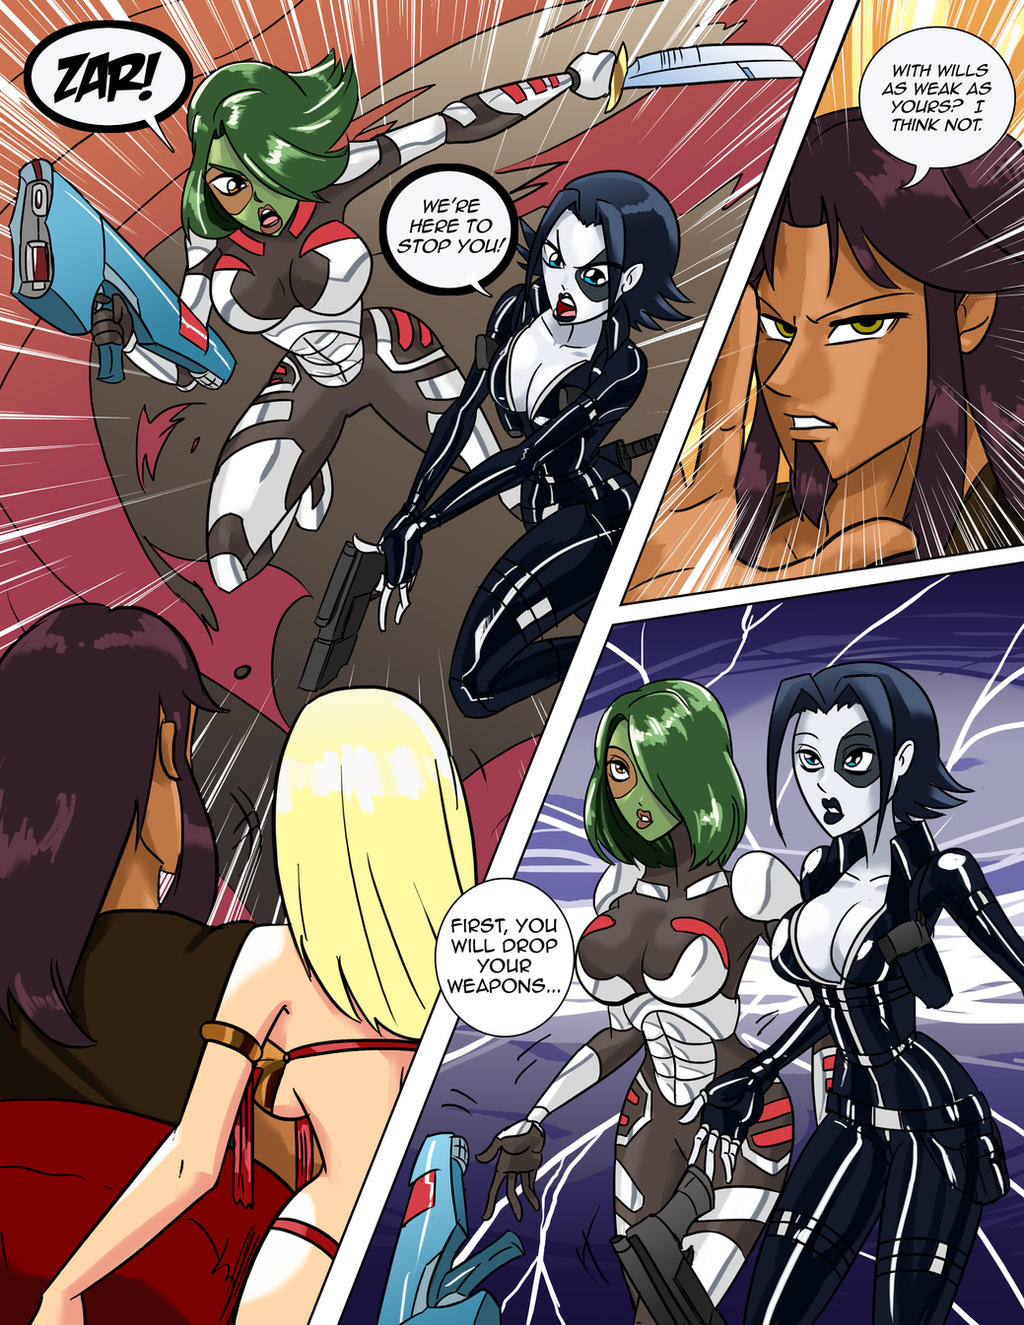 Kings harem nude girl